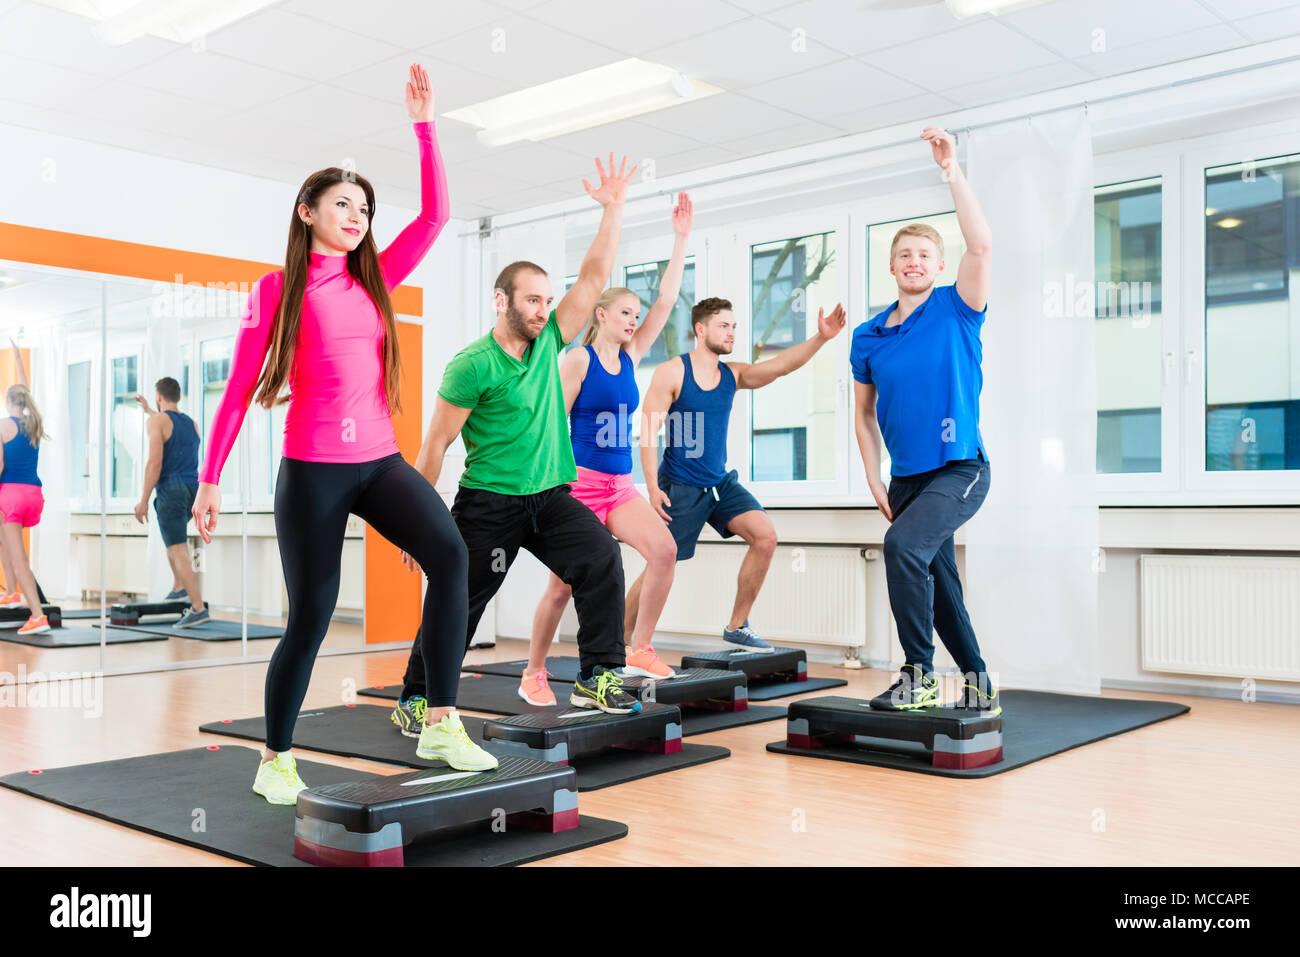 men and women doing step aerobics at gym stock photo 179751446 alamy